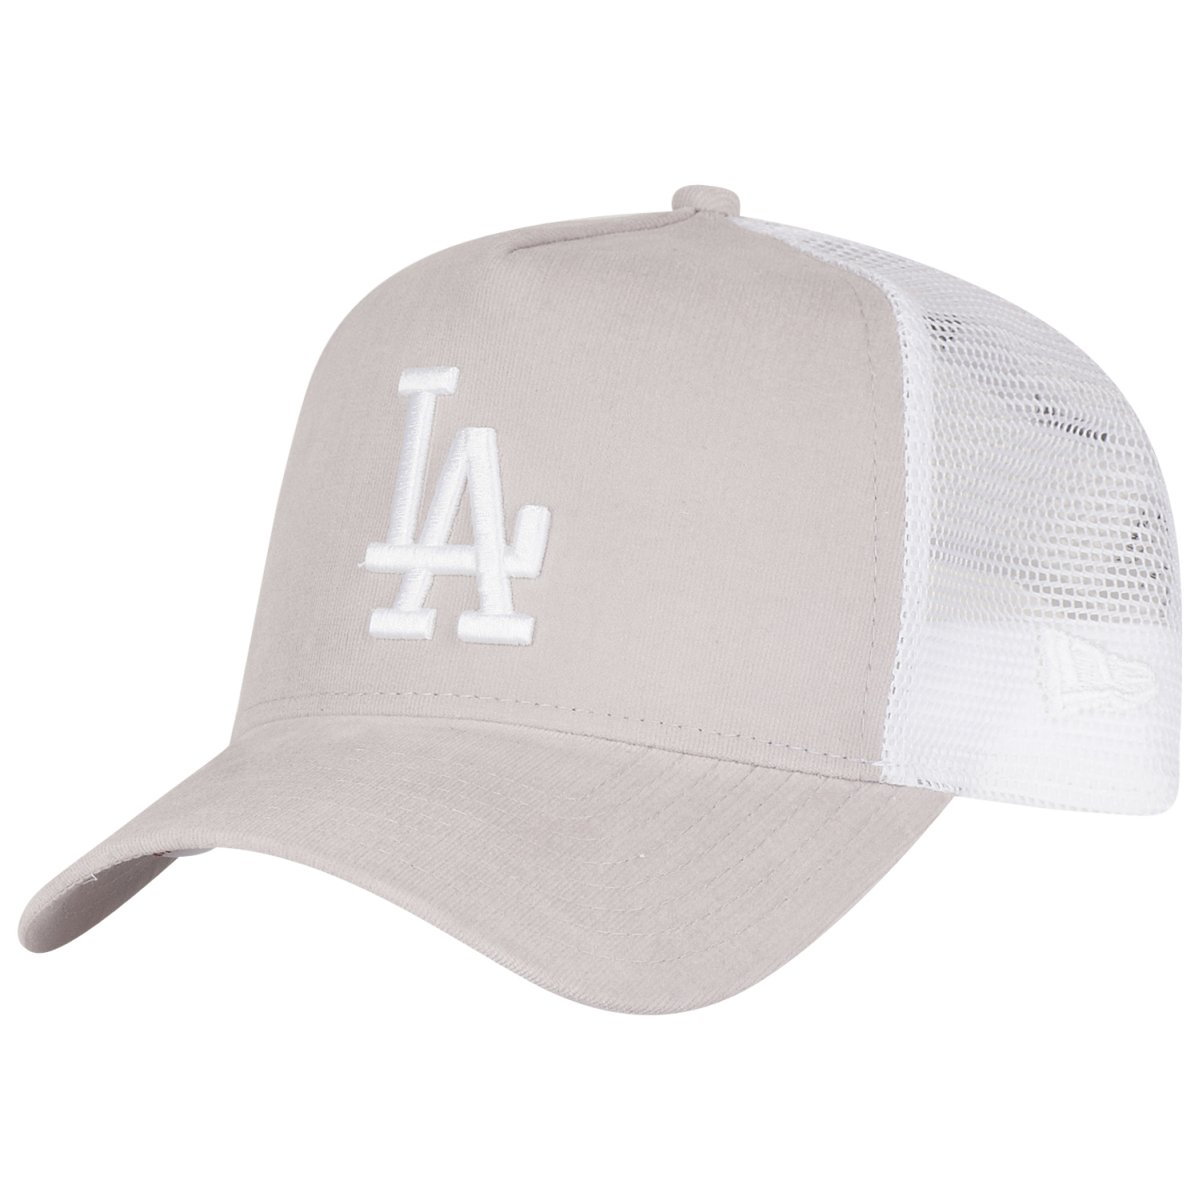 New Era Damen Trucker Cap - MICRO CORD Los Angeles Dodgers   eBay